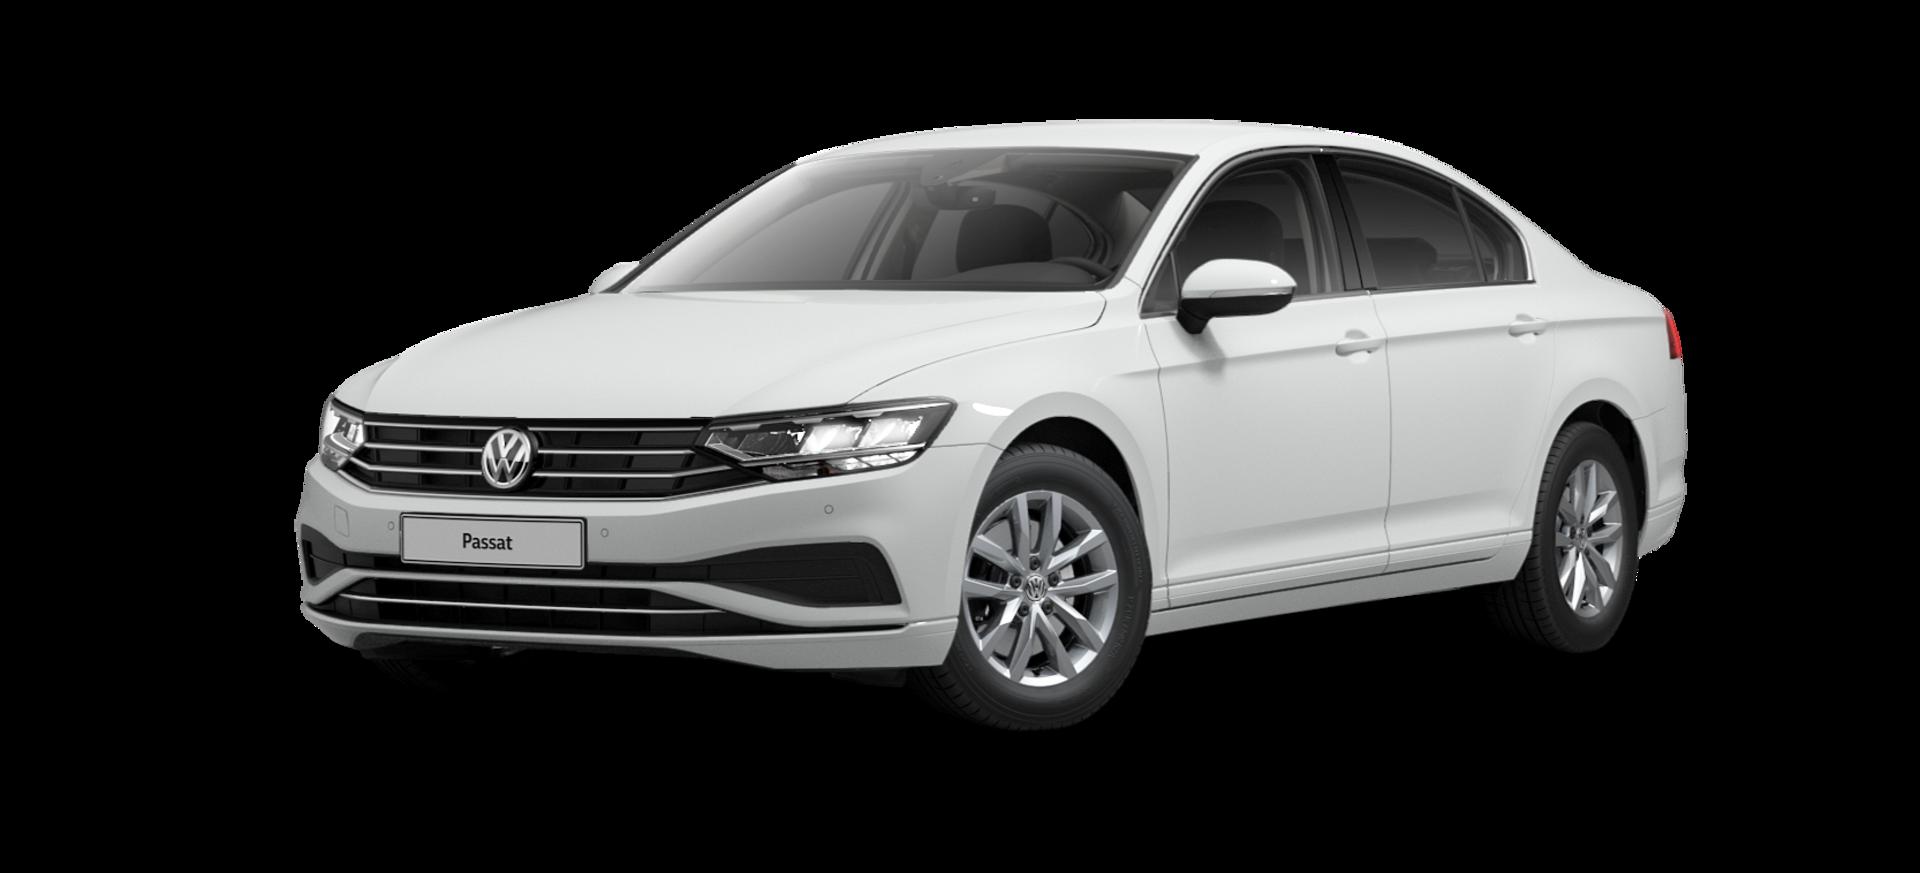 Noul Passat Comfortline 1.6 TDI DSG / 120 CP/88 kW / 1.6l / Direct Shift Gearbox / 4-usi : Volkswagen Passat